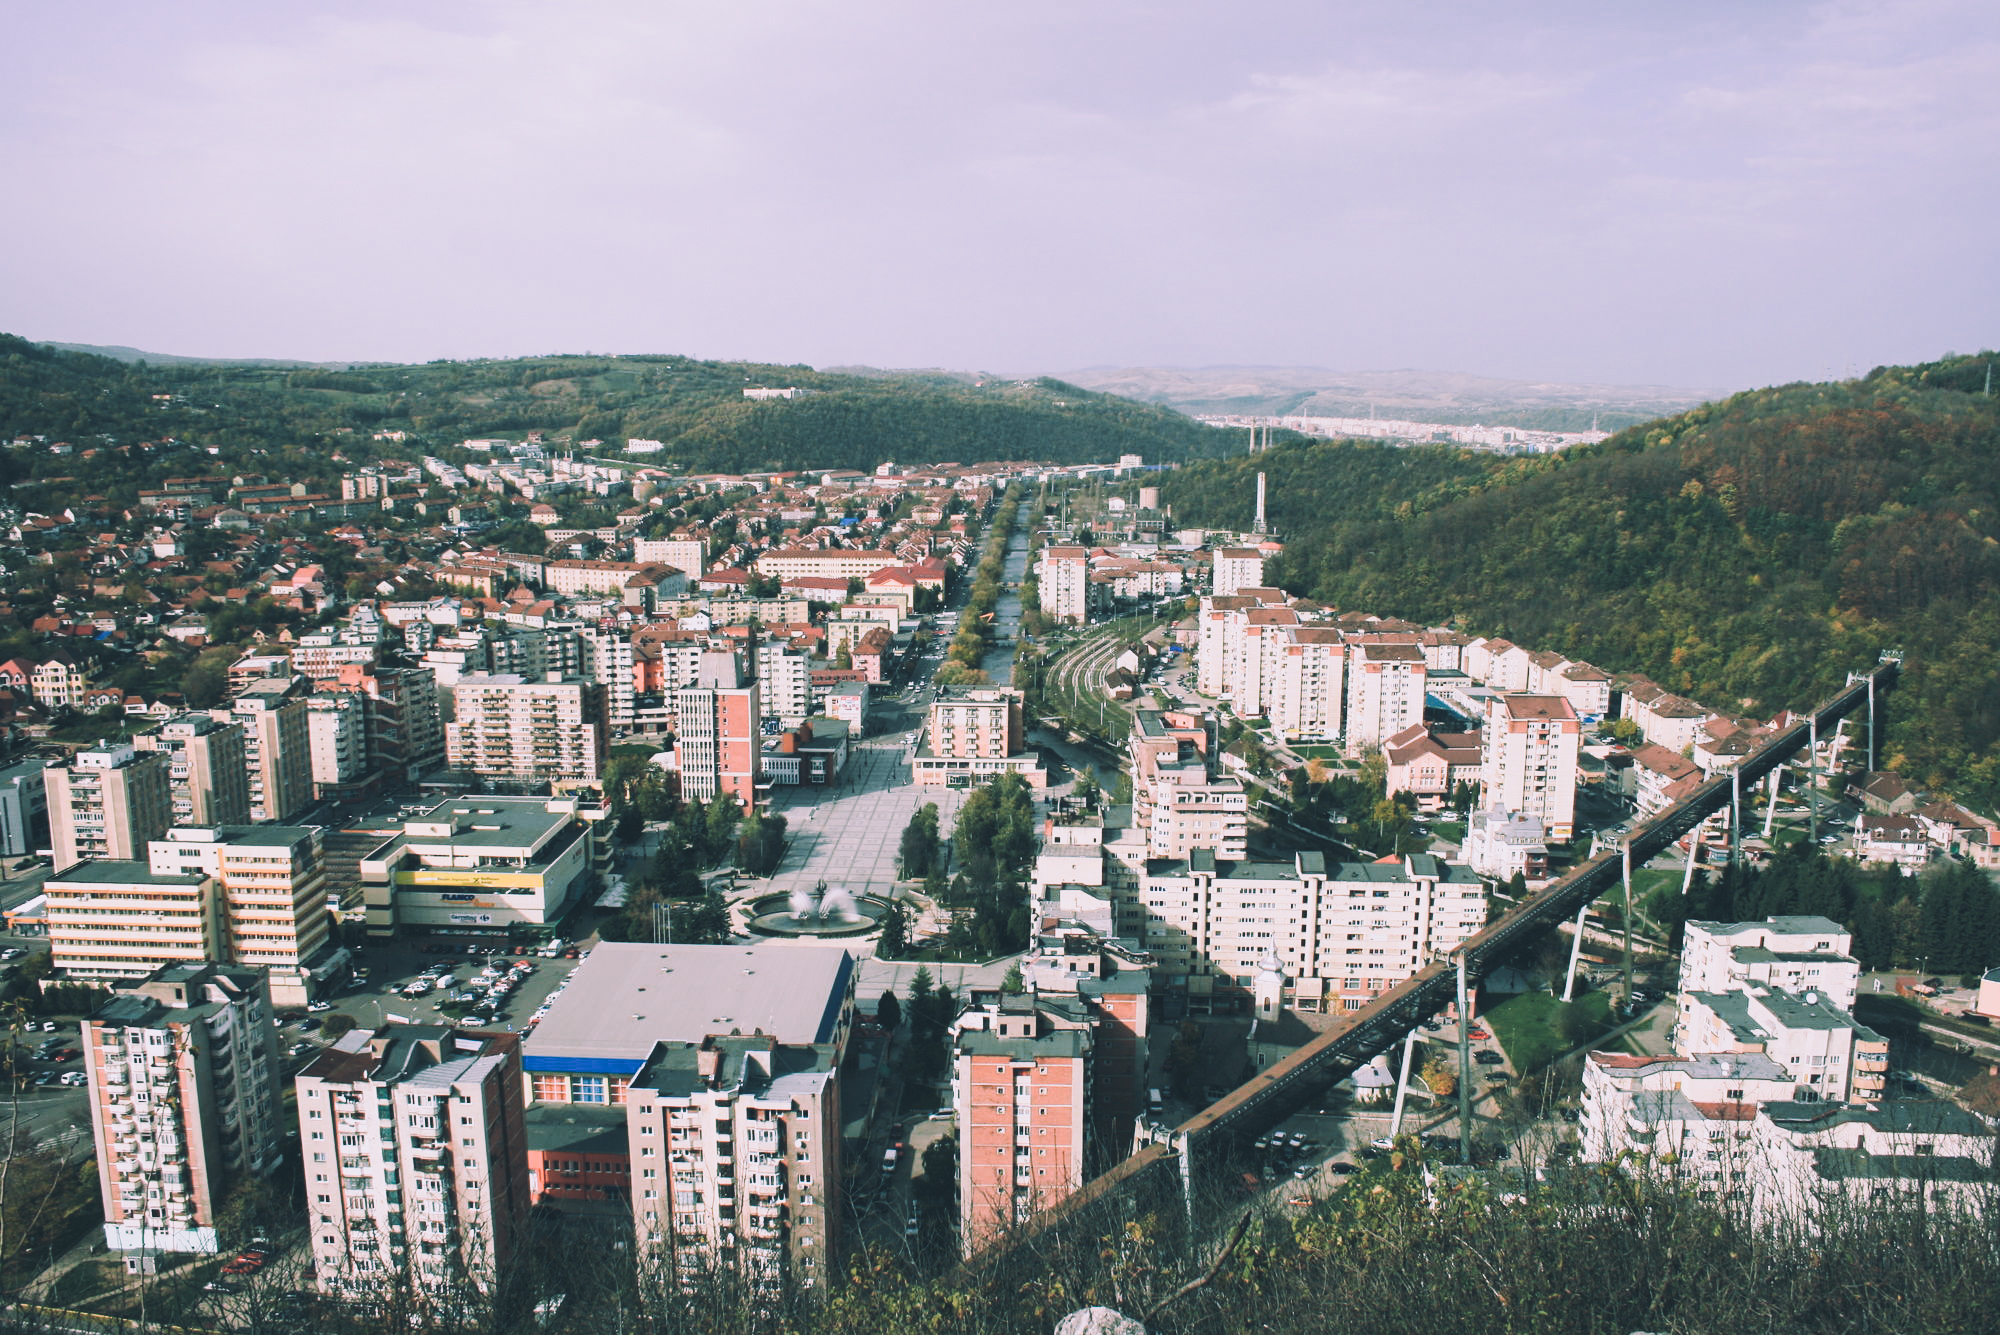 Stanescu's hometown of Resita in Romania